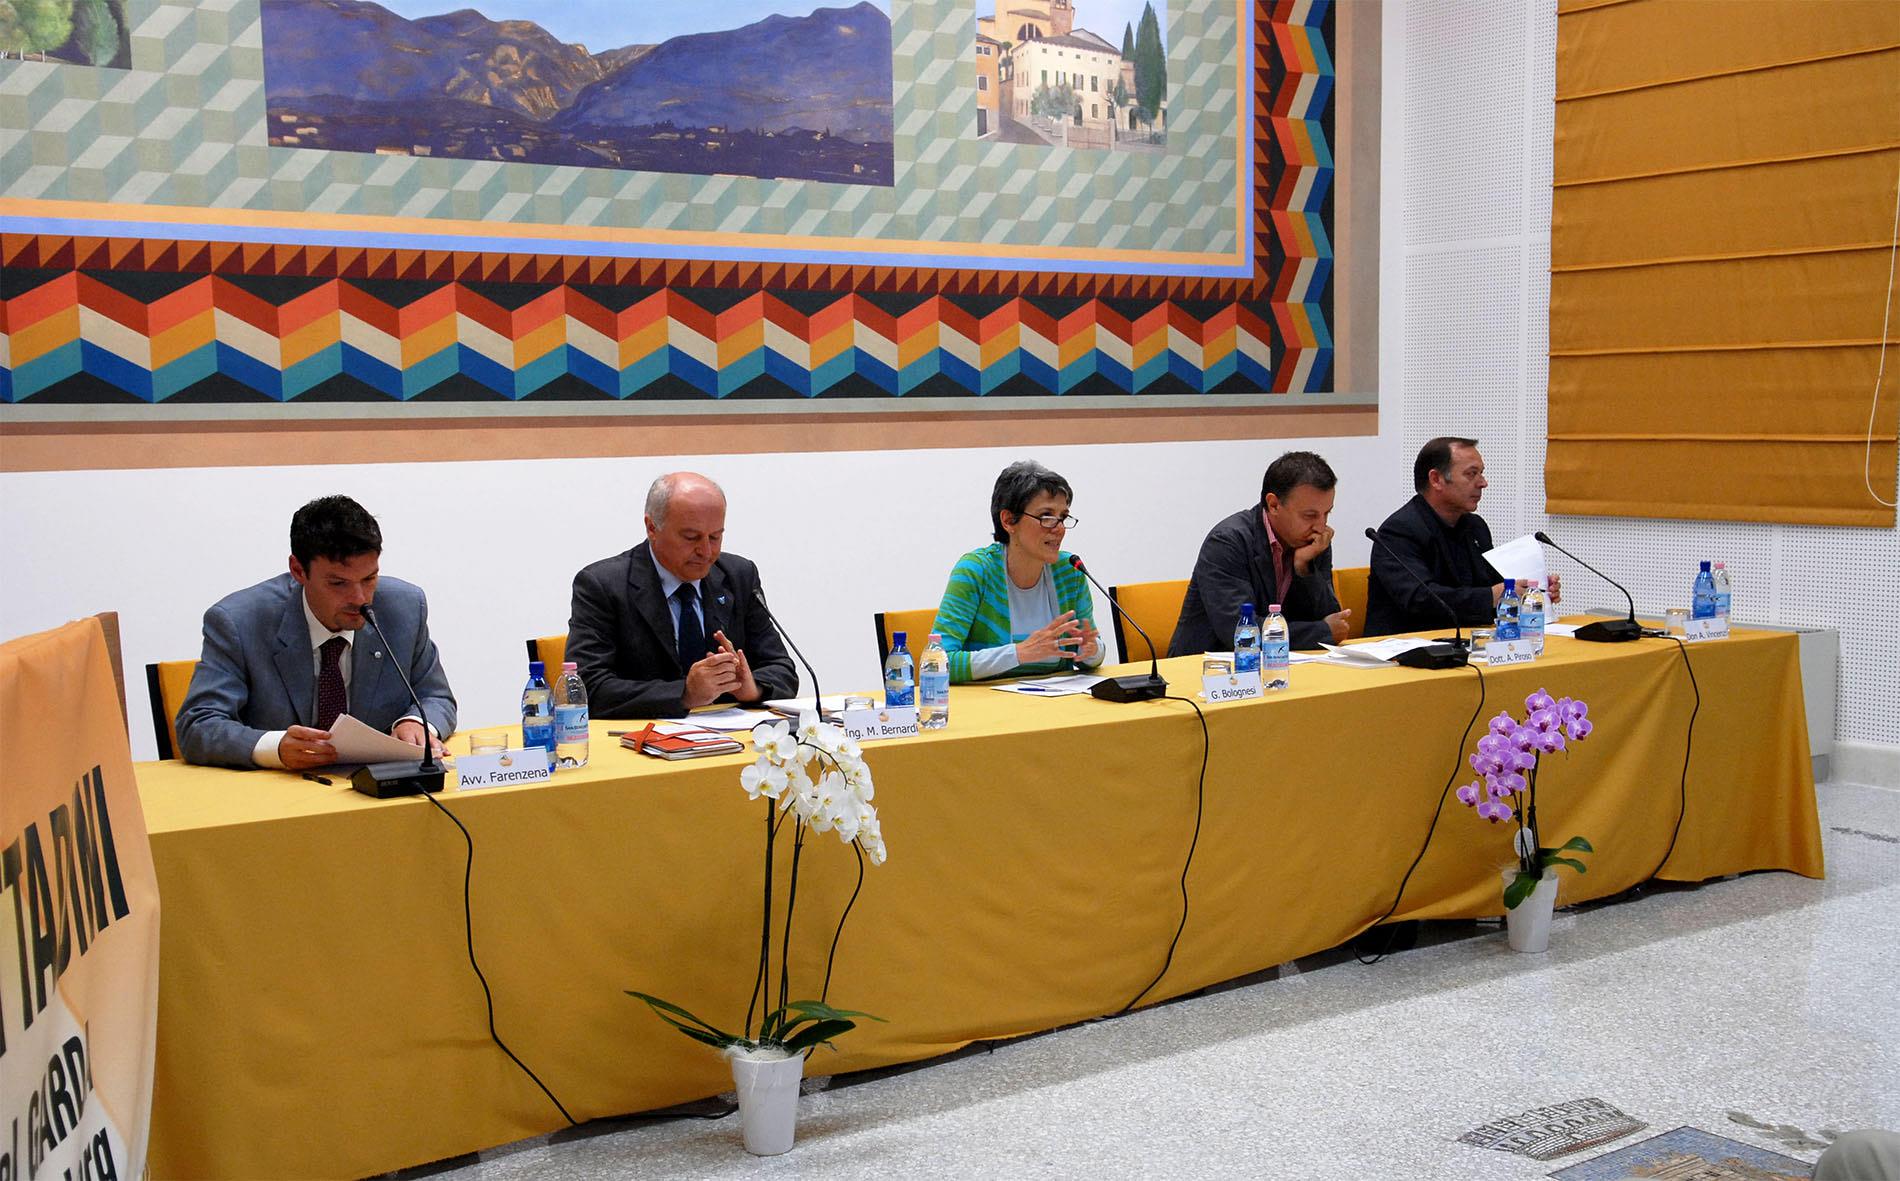 Foto ospiti tavola rotonda